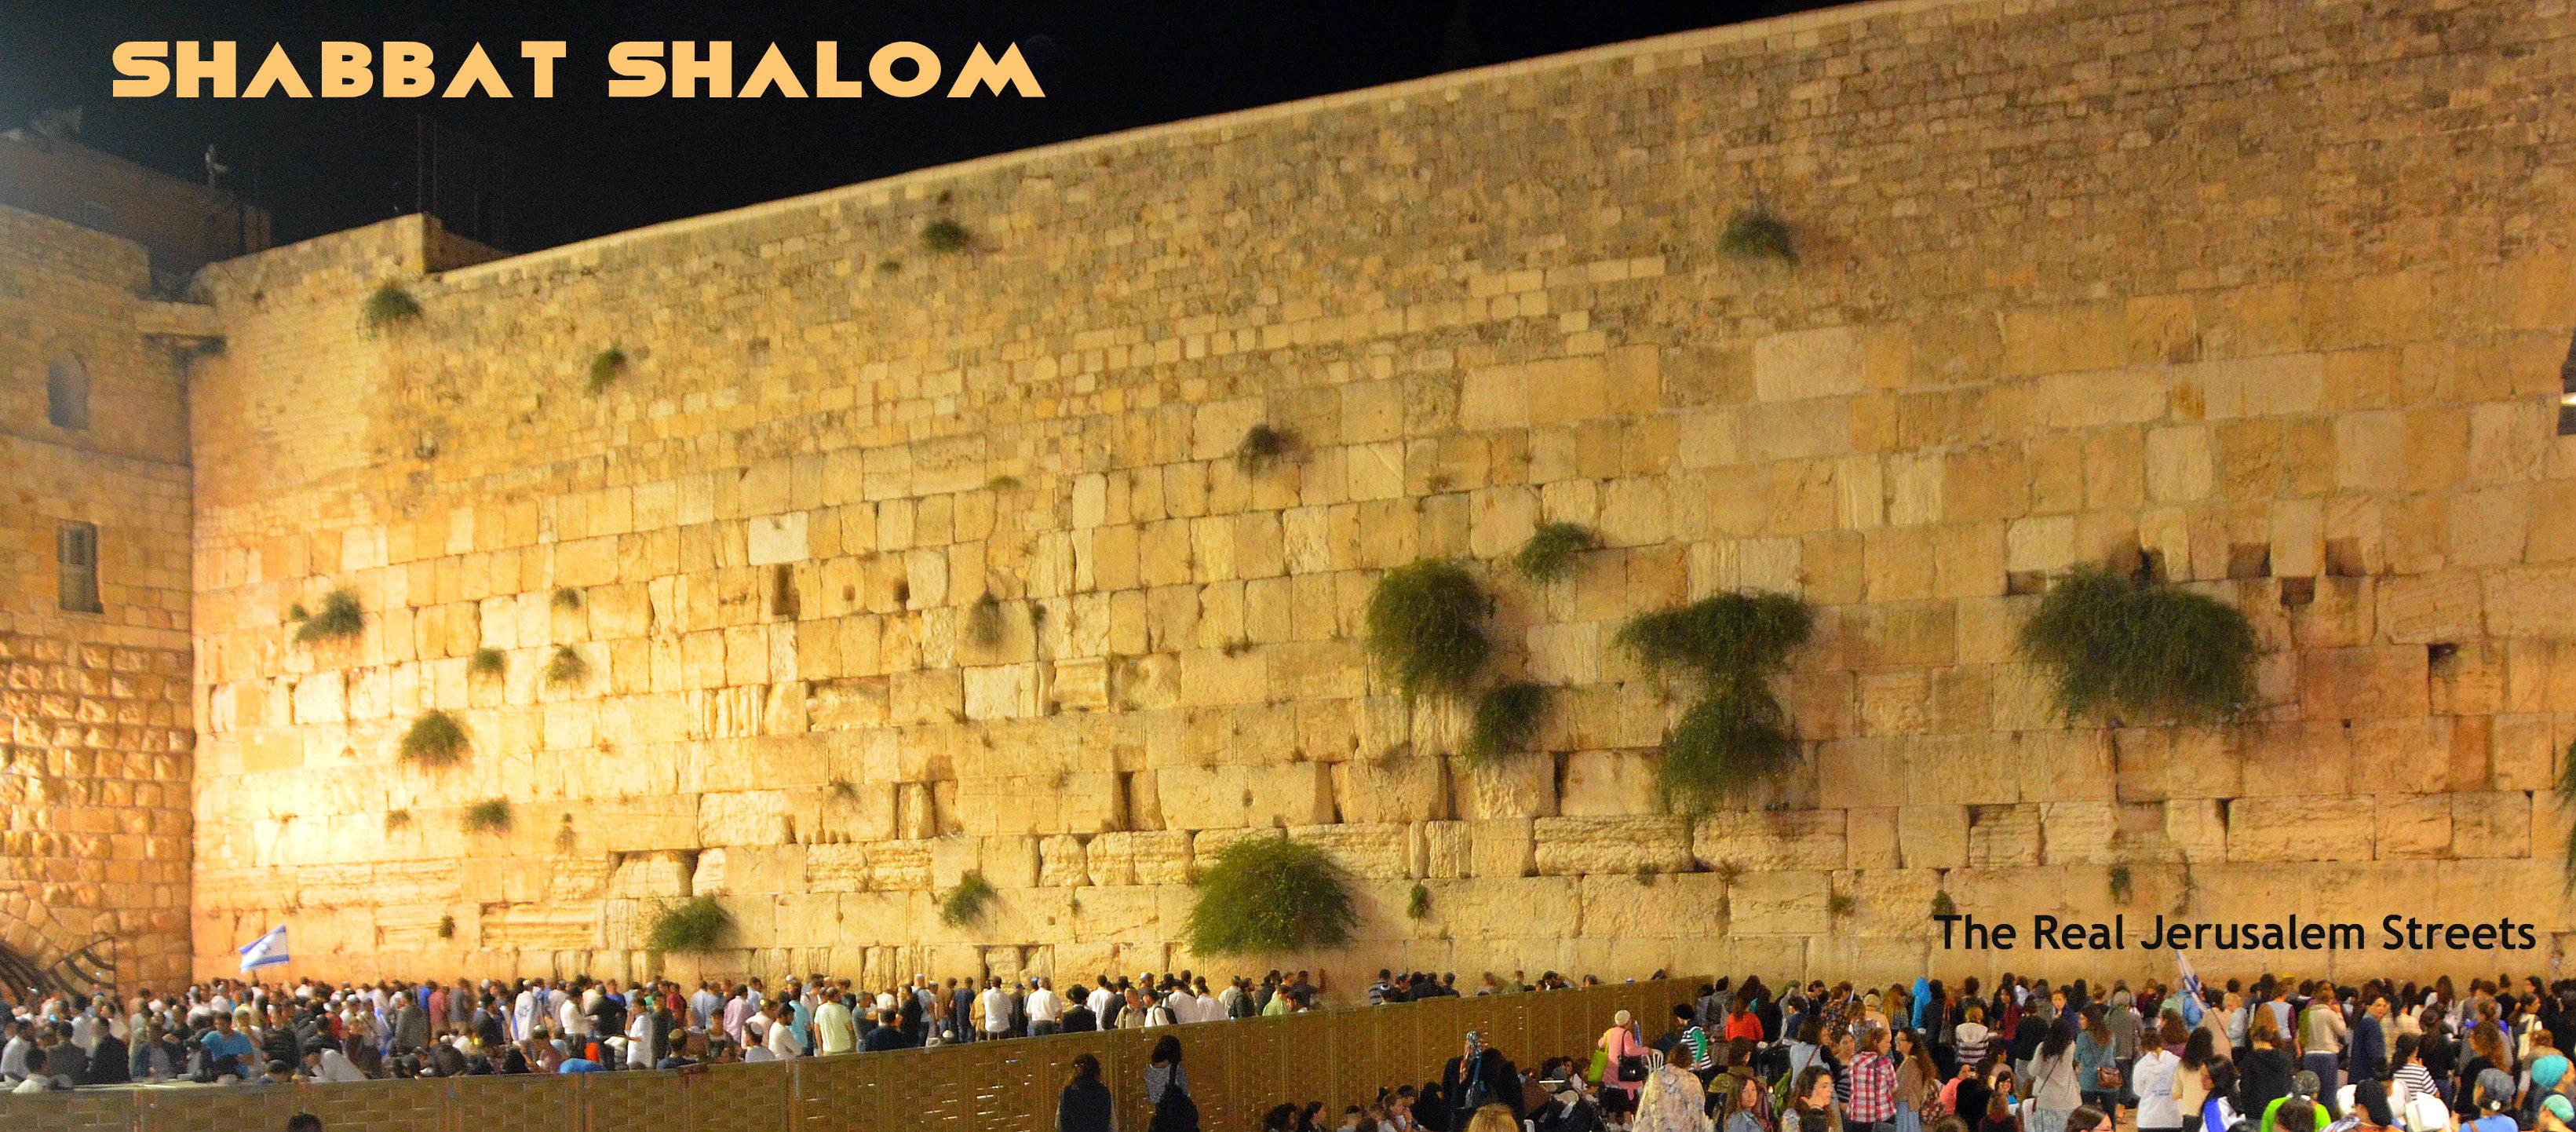 Shabbat shalom poster, western wall, kossel, kotel